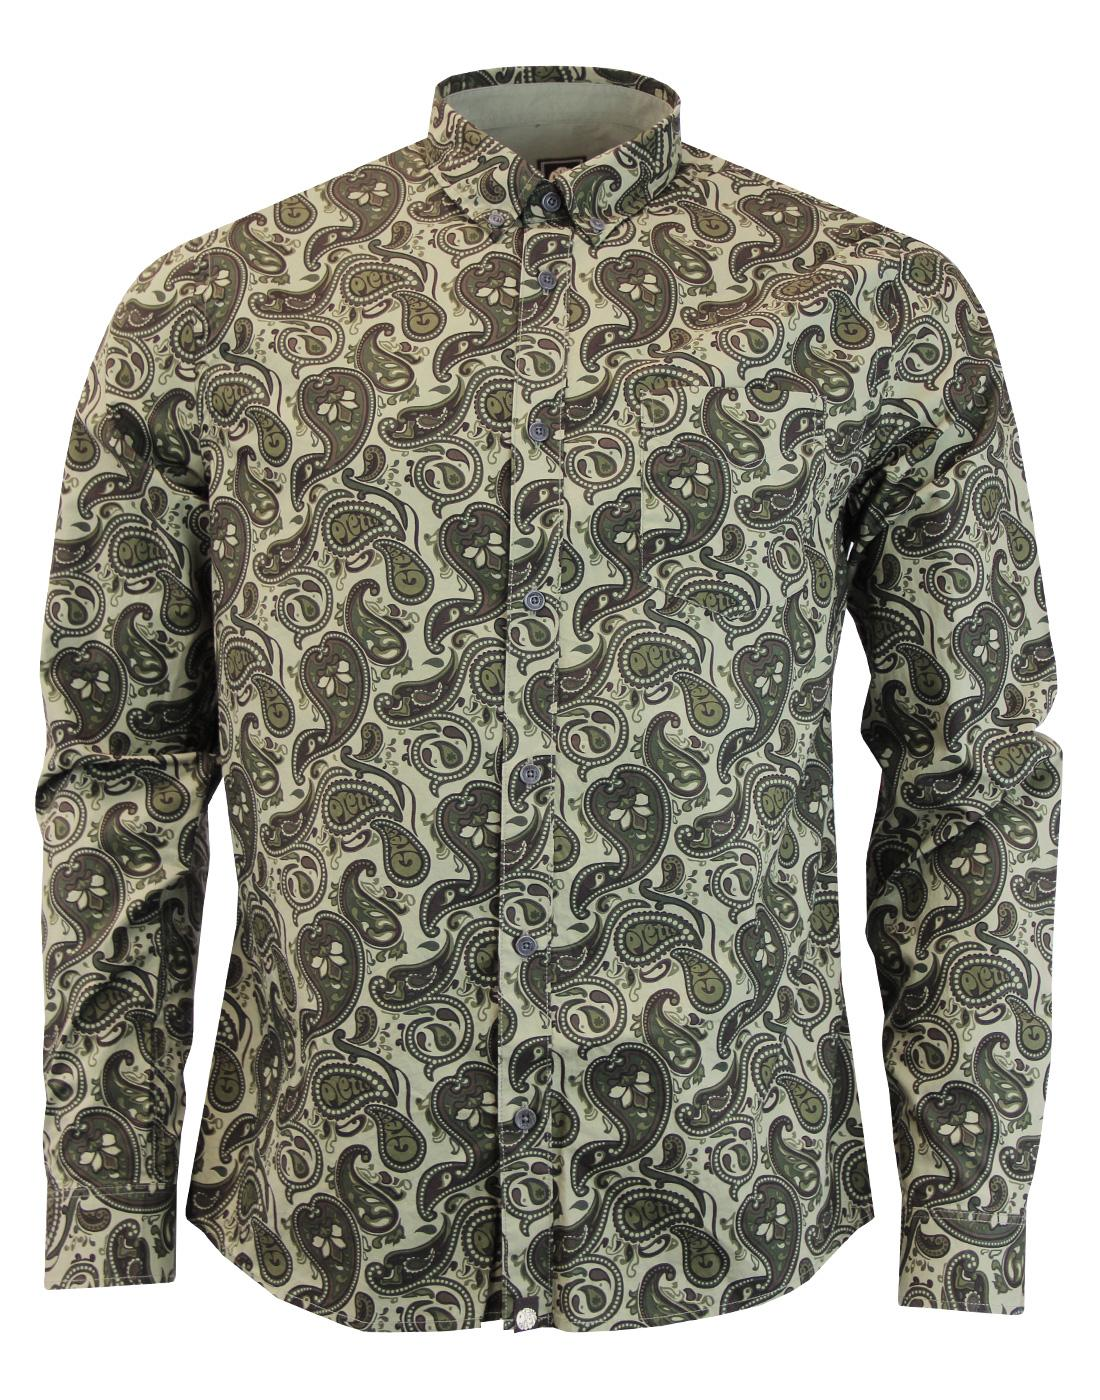 Ryder PRETTY GREEN 60s Mod Signature Paisley Shirt